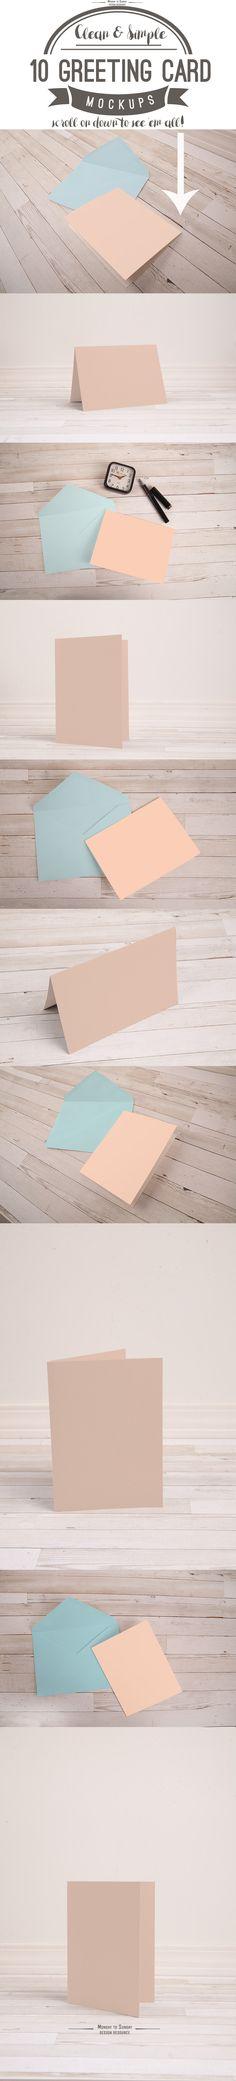 10 A7 (5x7) Greeting Card Mockups - Product Mockups - 2